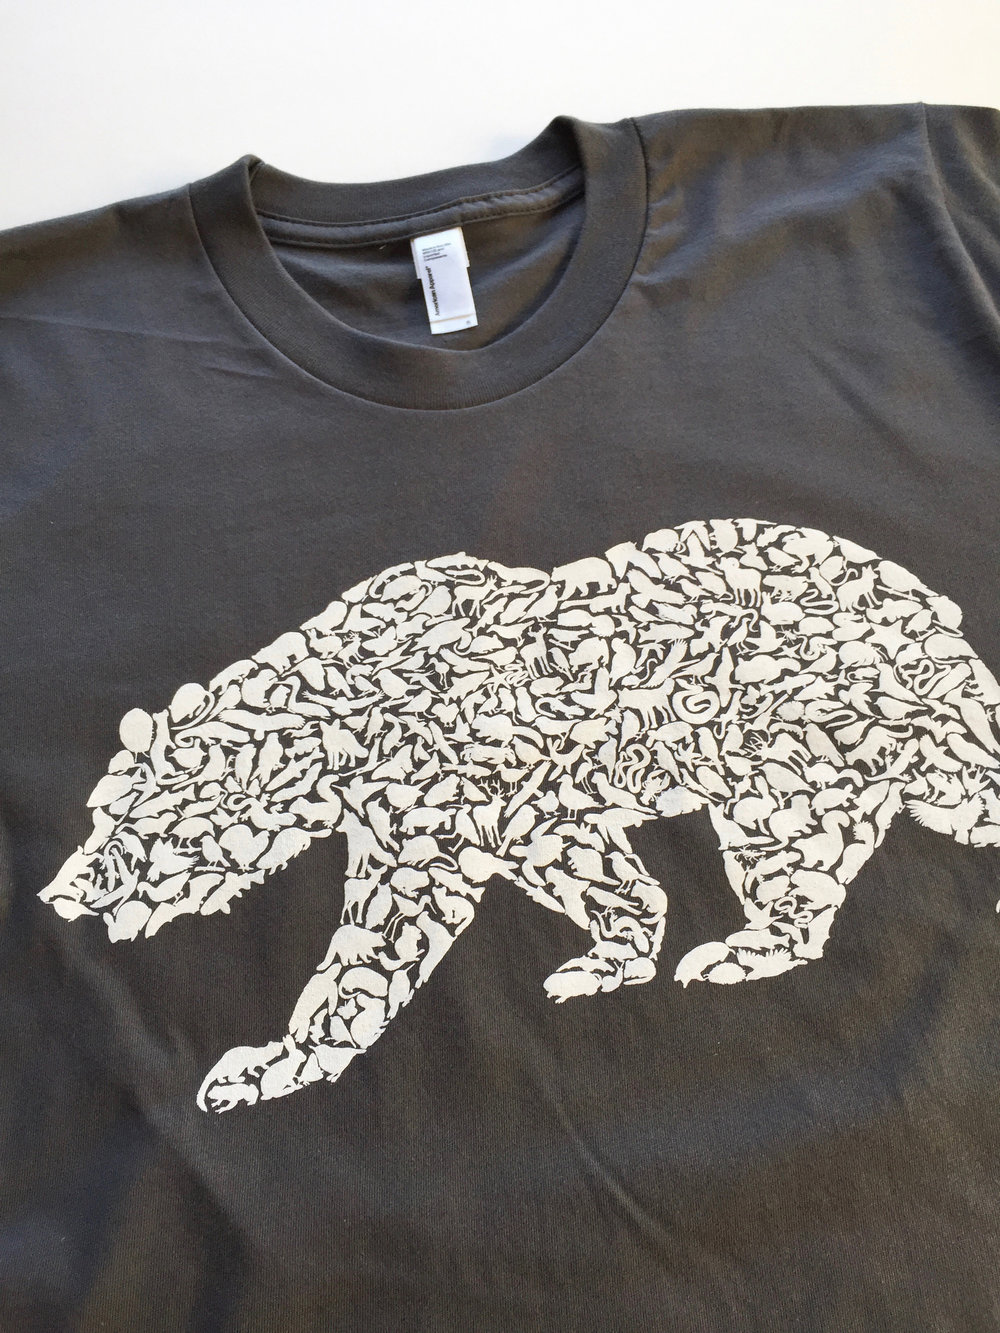 Grizzly Bear T-shirt.jpg